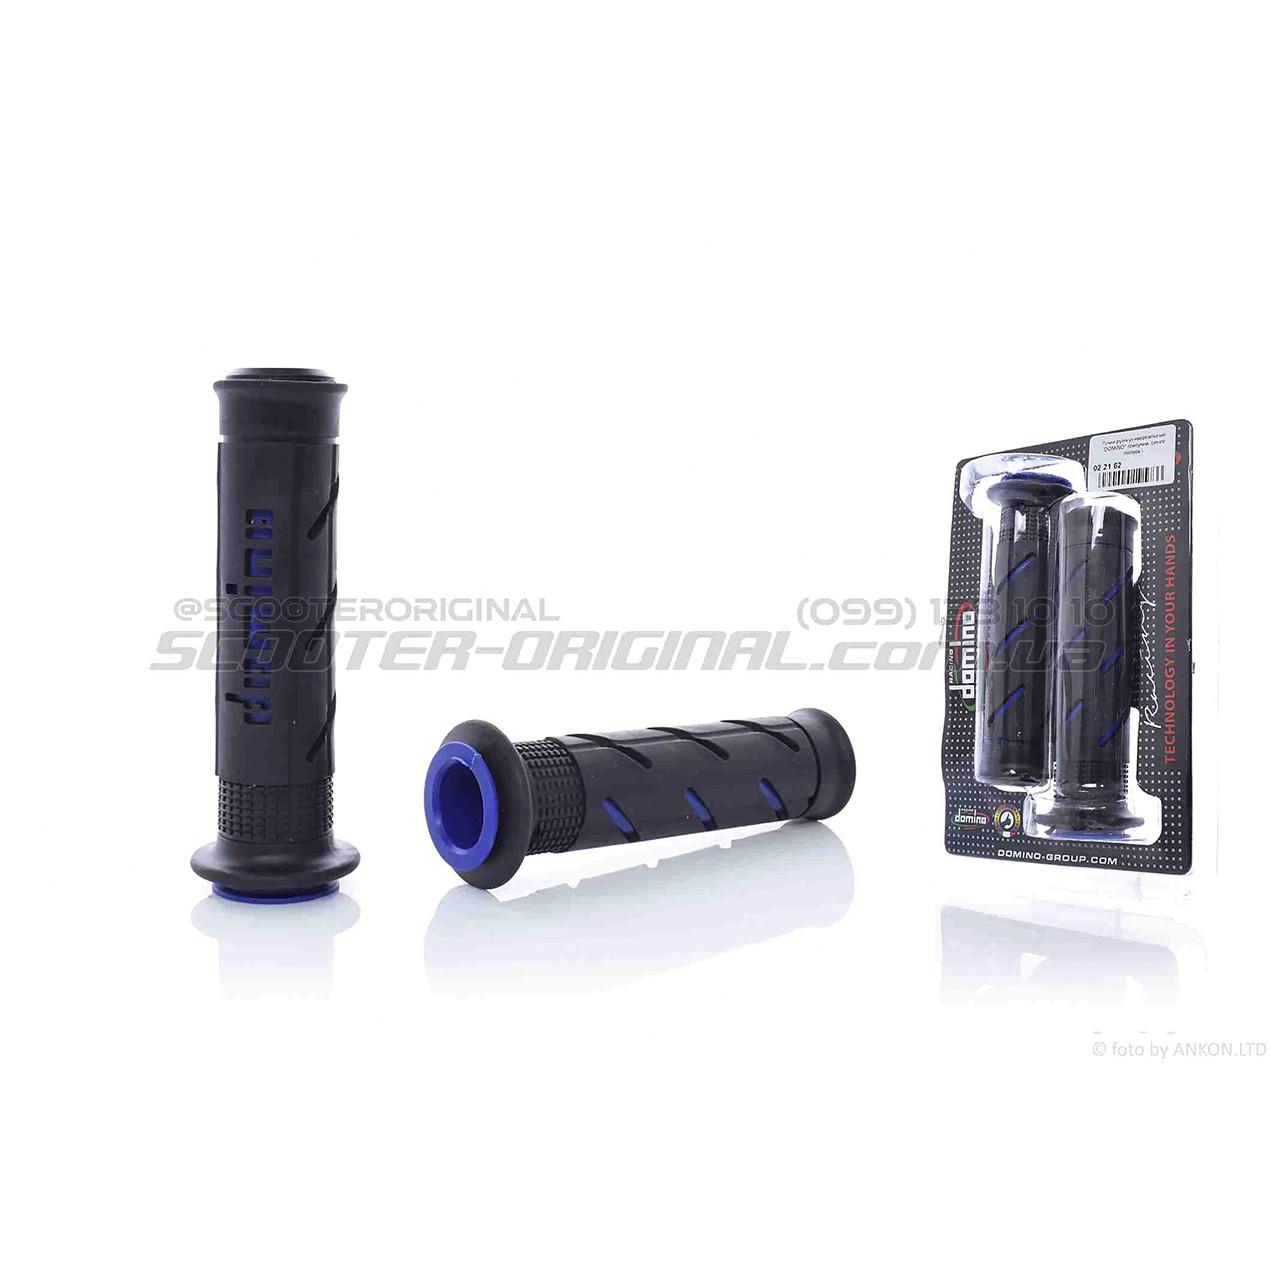 Грипсы Domino A250 черно-синие 130 мм Ø22 мм